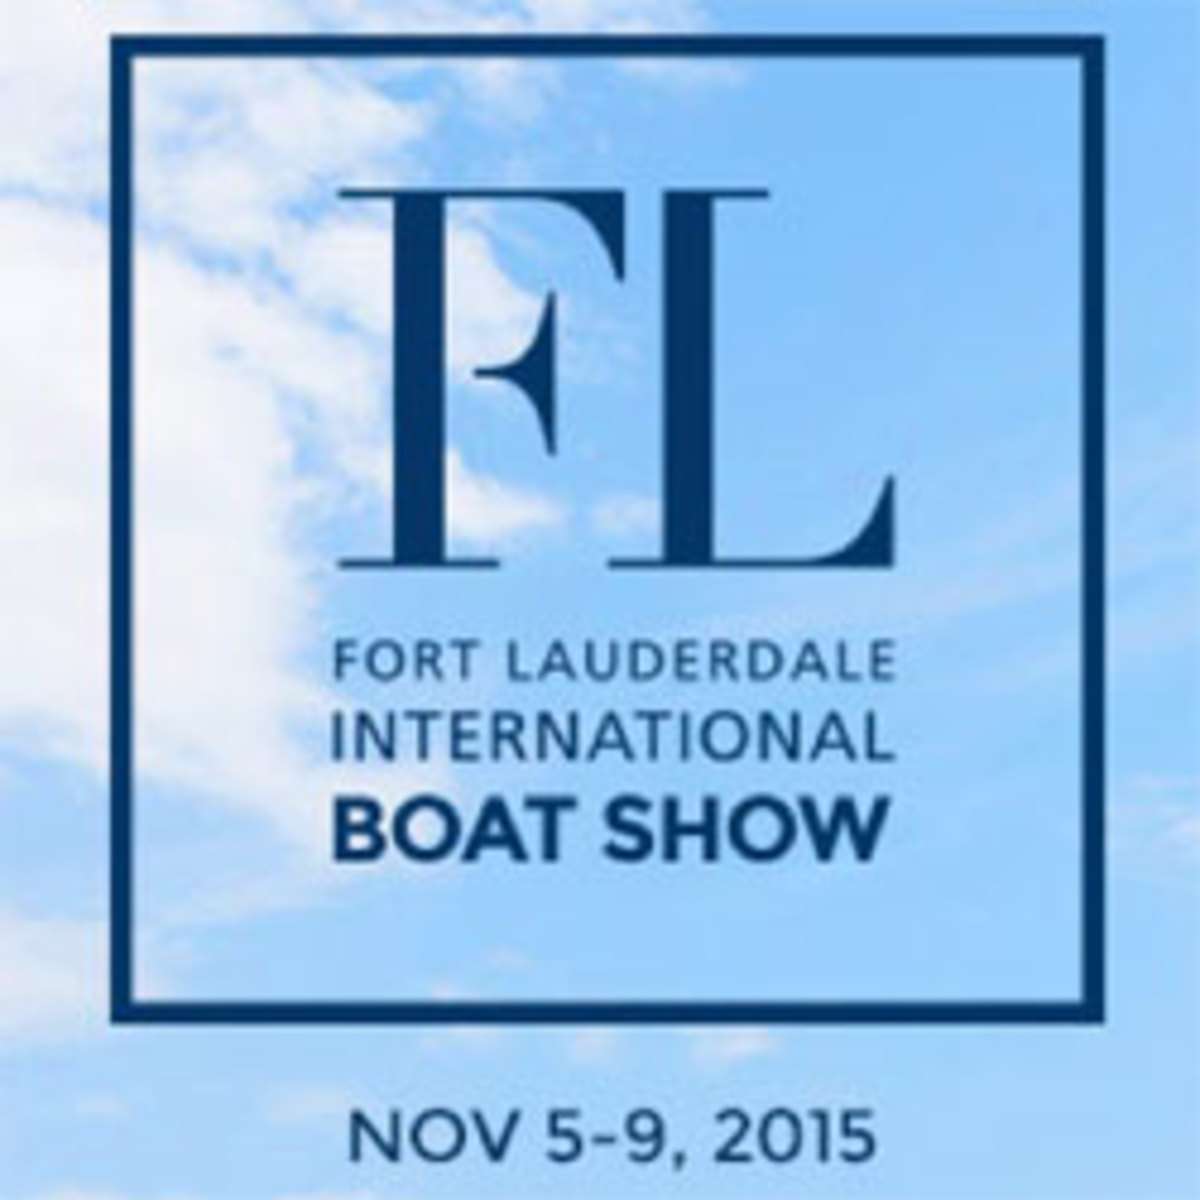 Ft Lauderdale International Boat Show logo